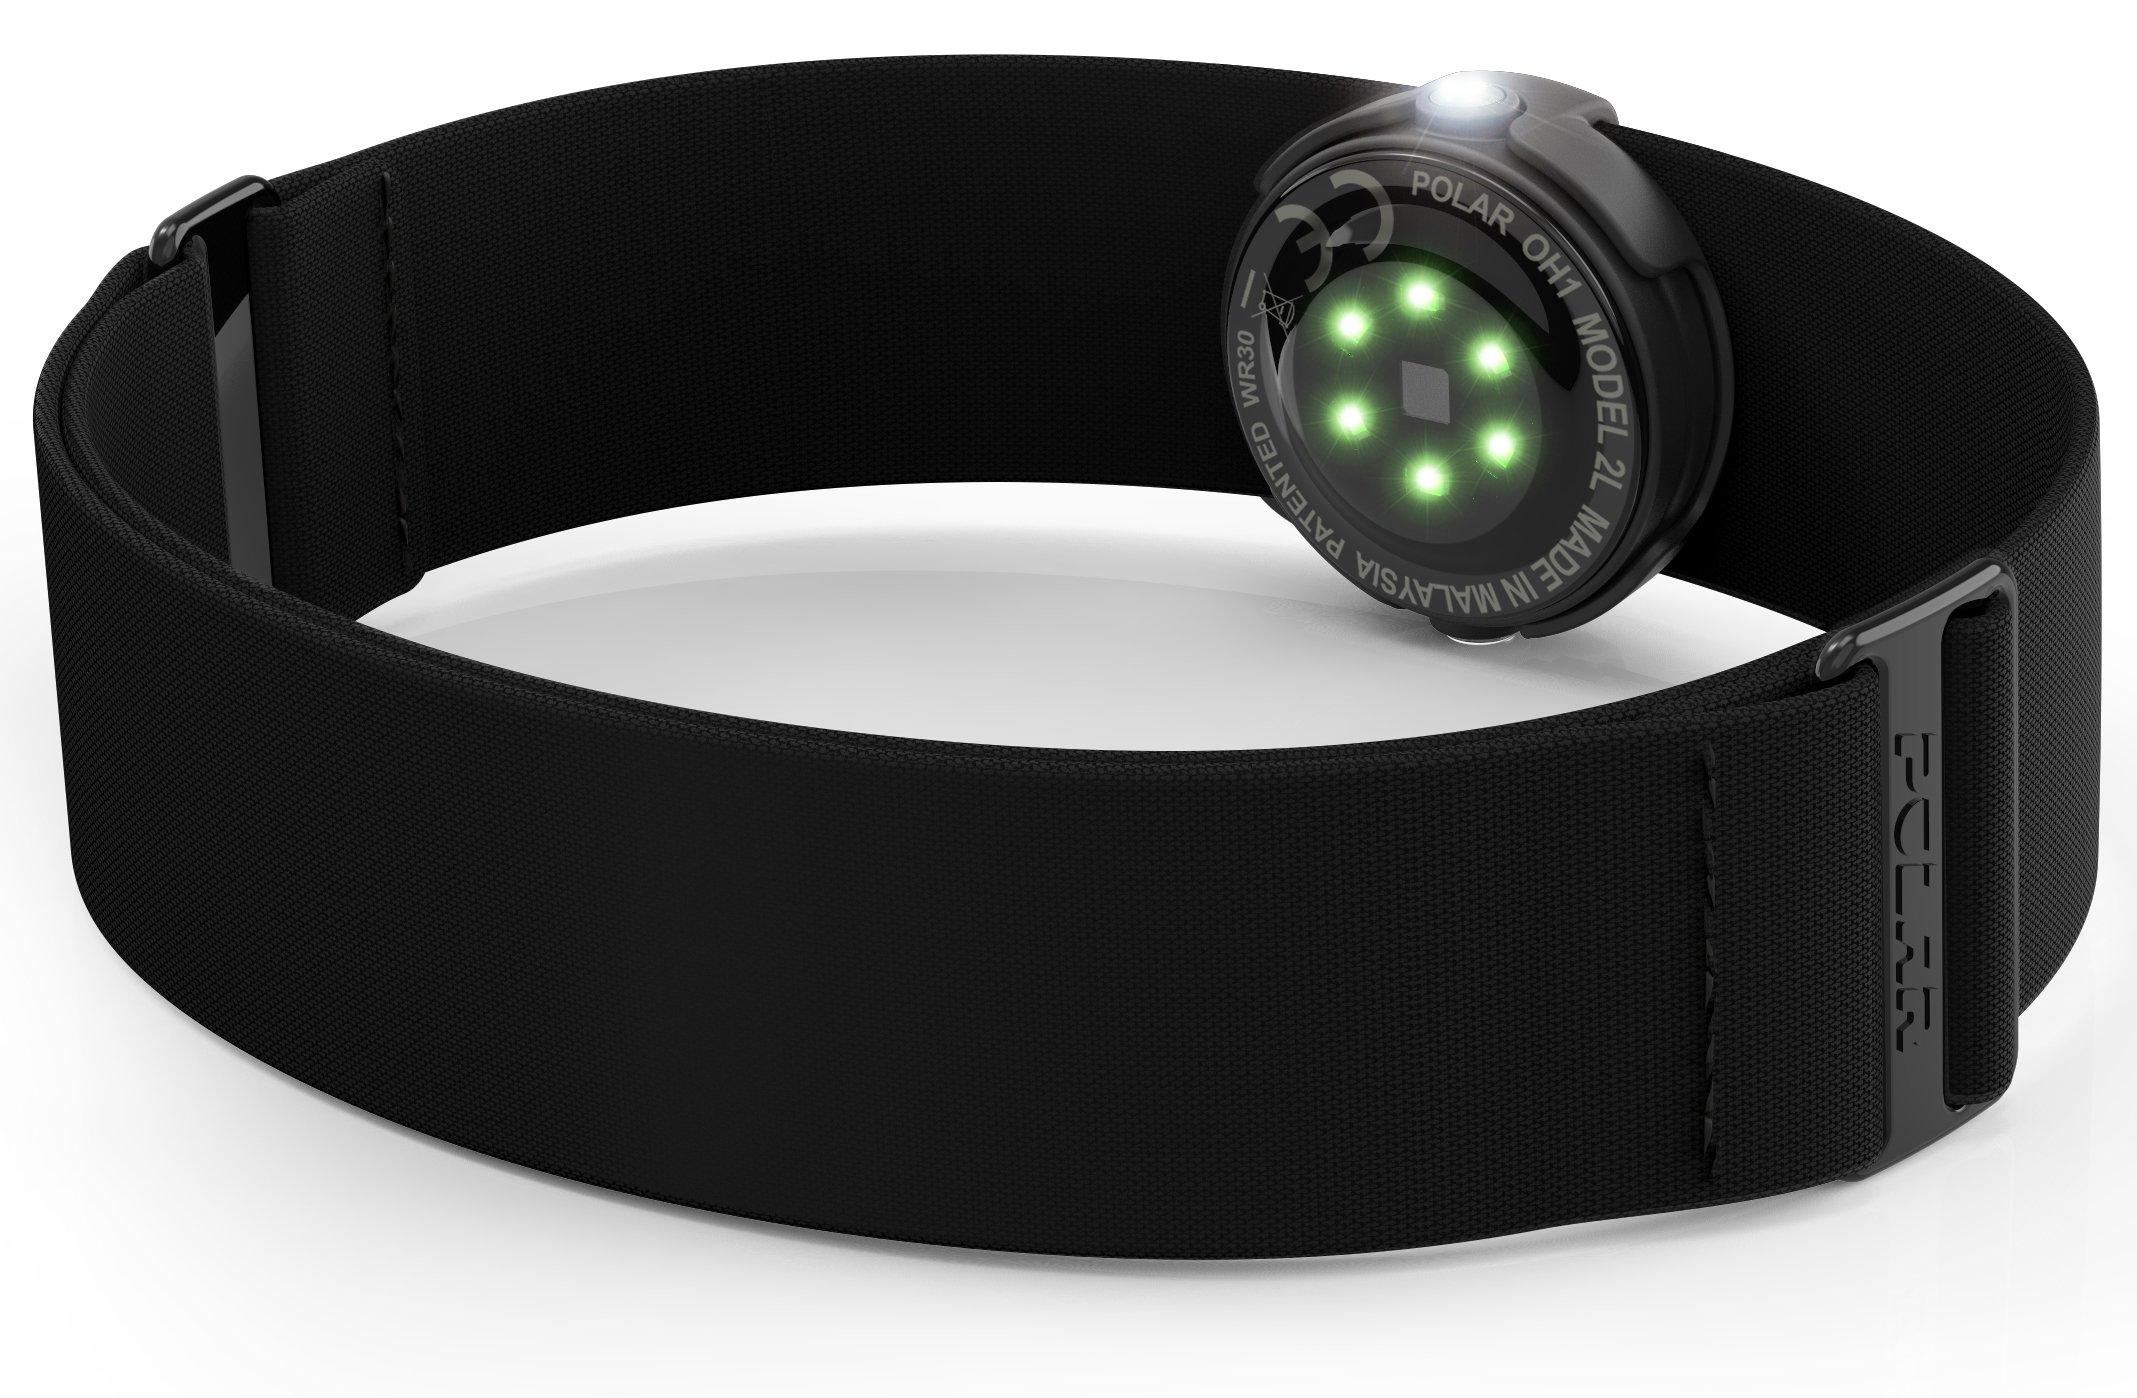 Polar OH1 Sensore Frequenza Cardiaca da Braccio, Unisex – Adulto, Nero, M-XXL product image